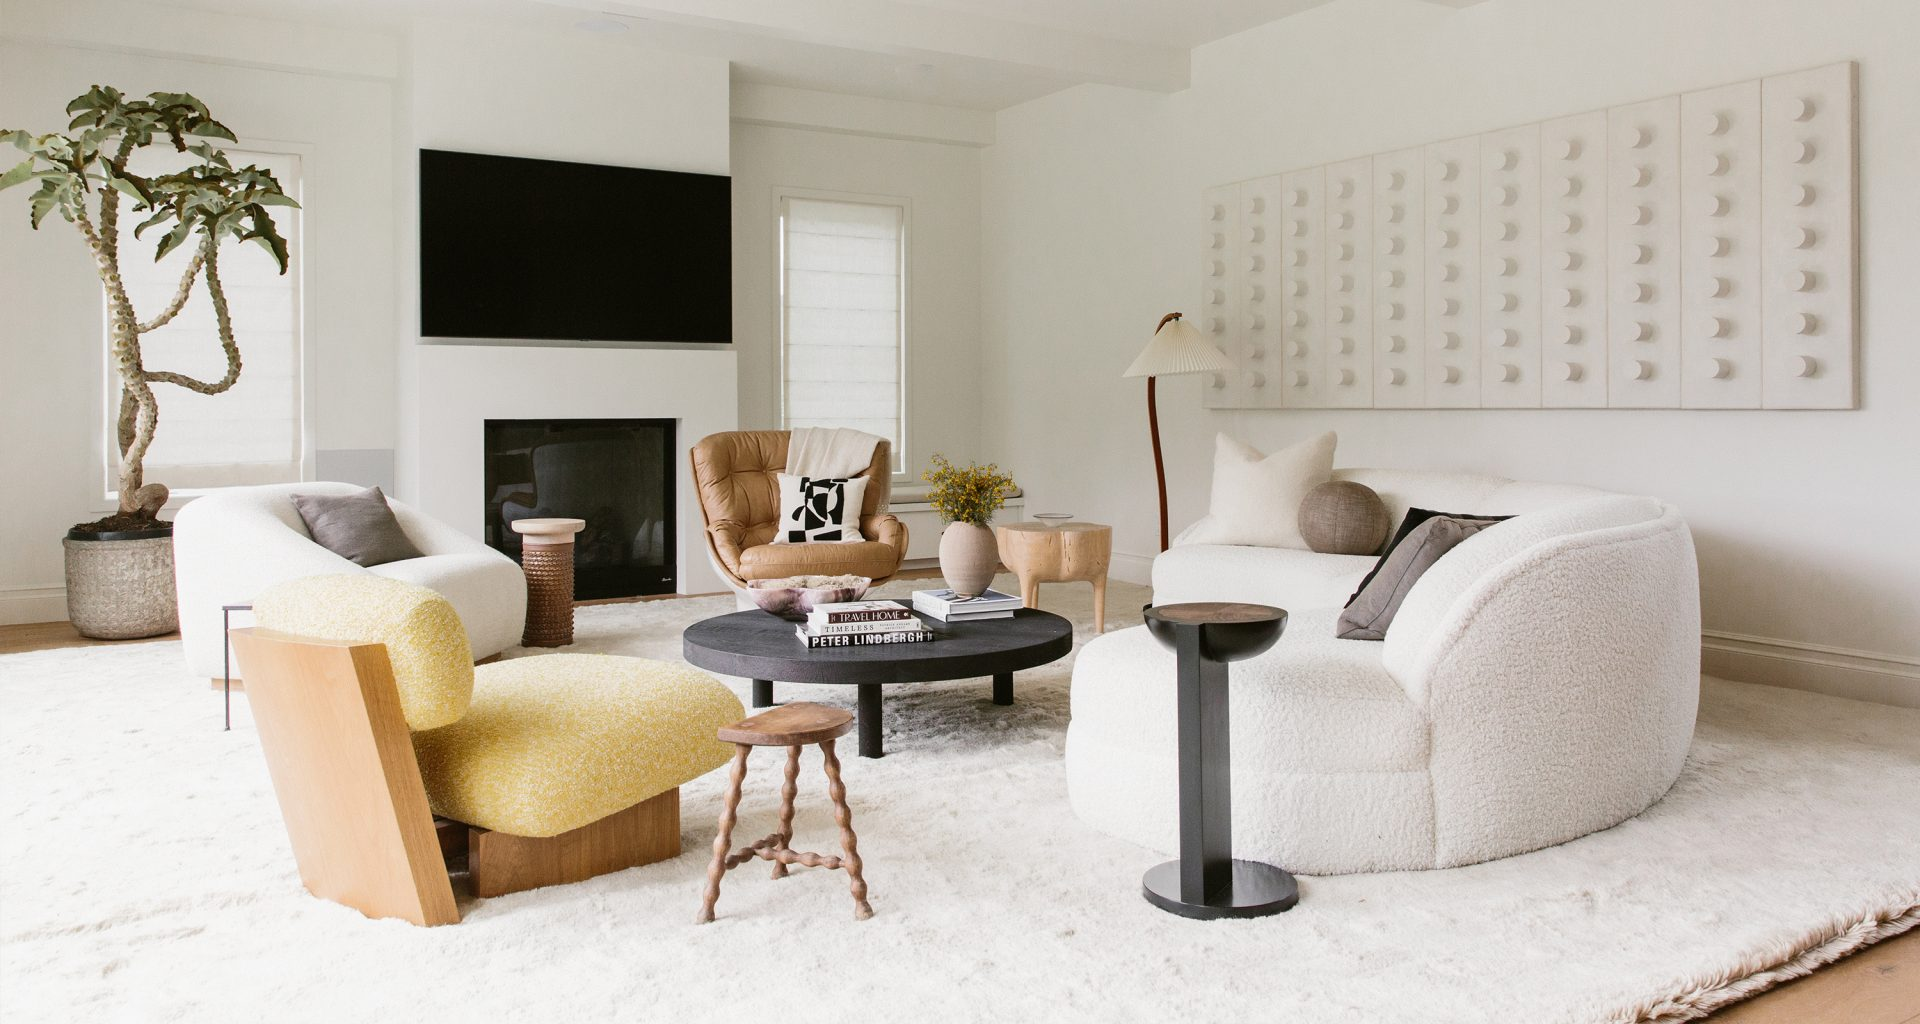 The Interior Design Studio With an Artful Eye for California Design